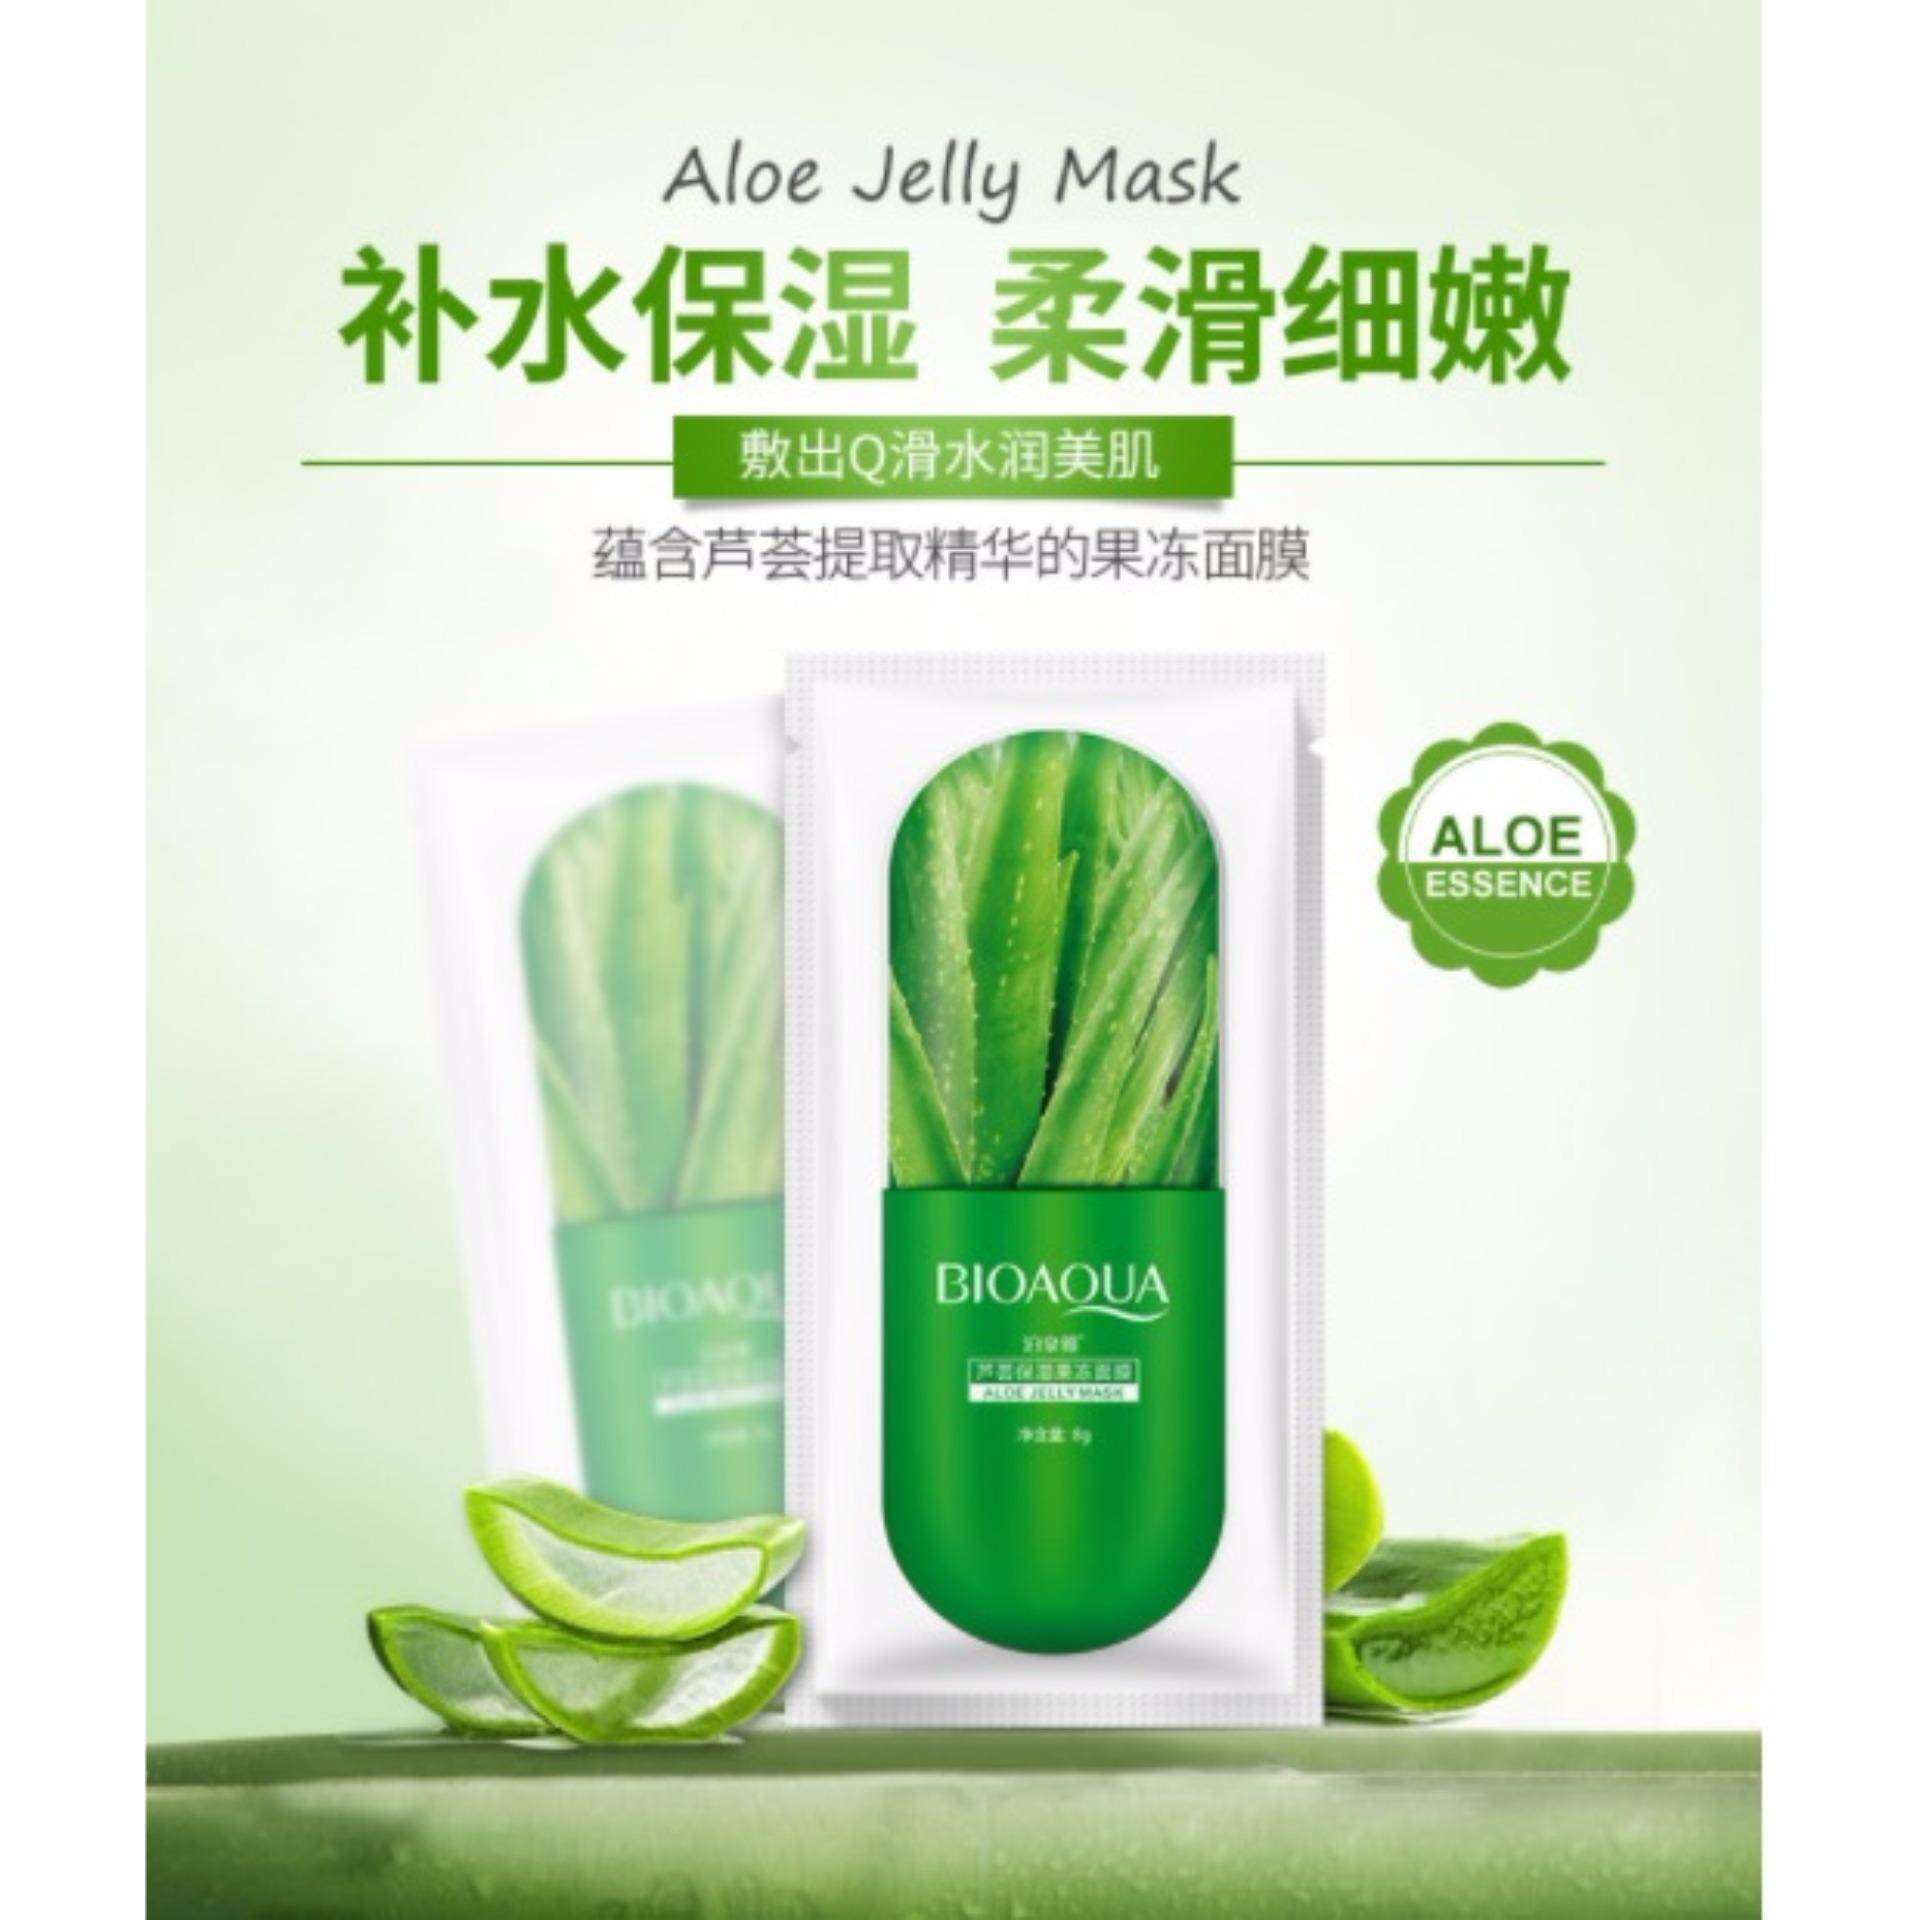 Semakan Semula Sinma Bioaqua Aloe Essence Jelly Facial Mask 5 Aloevera Cheapest Price Sheets Vera